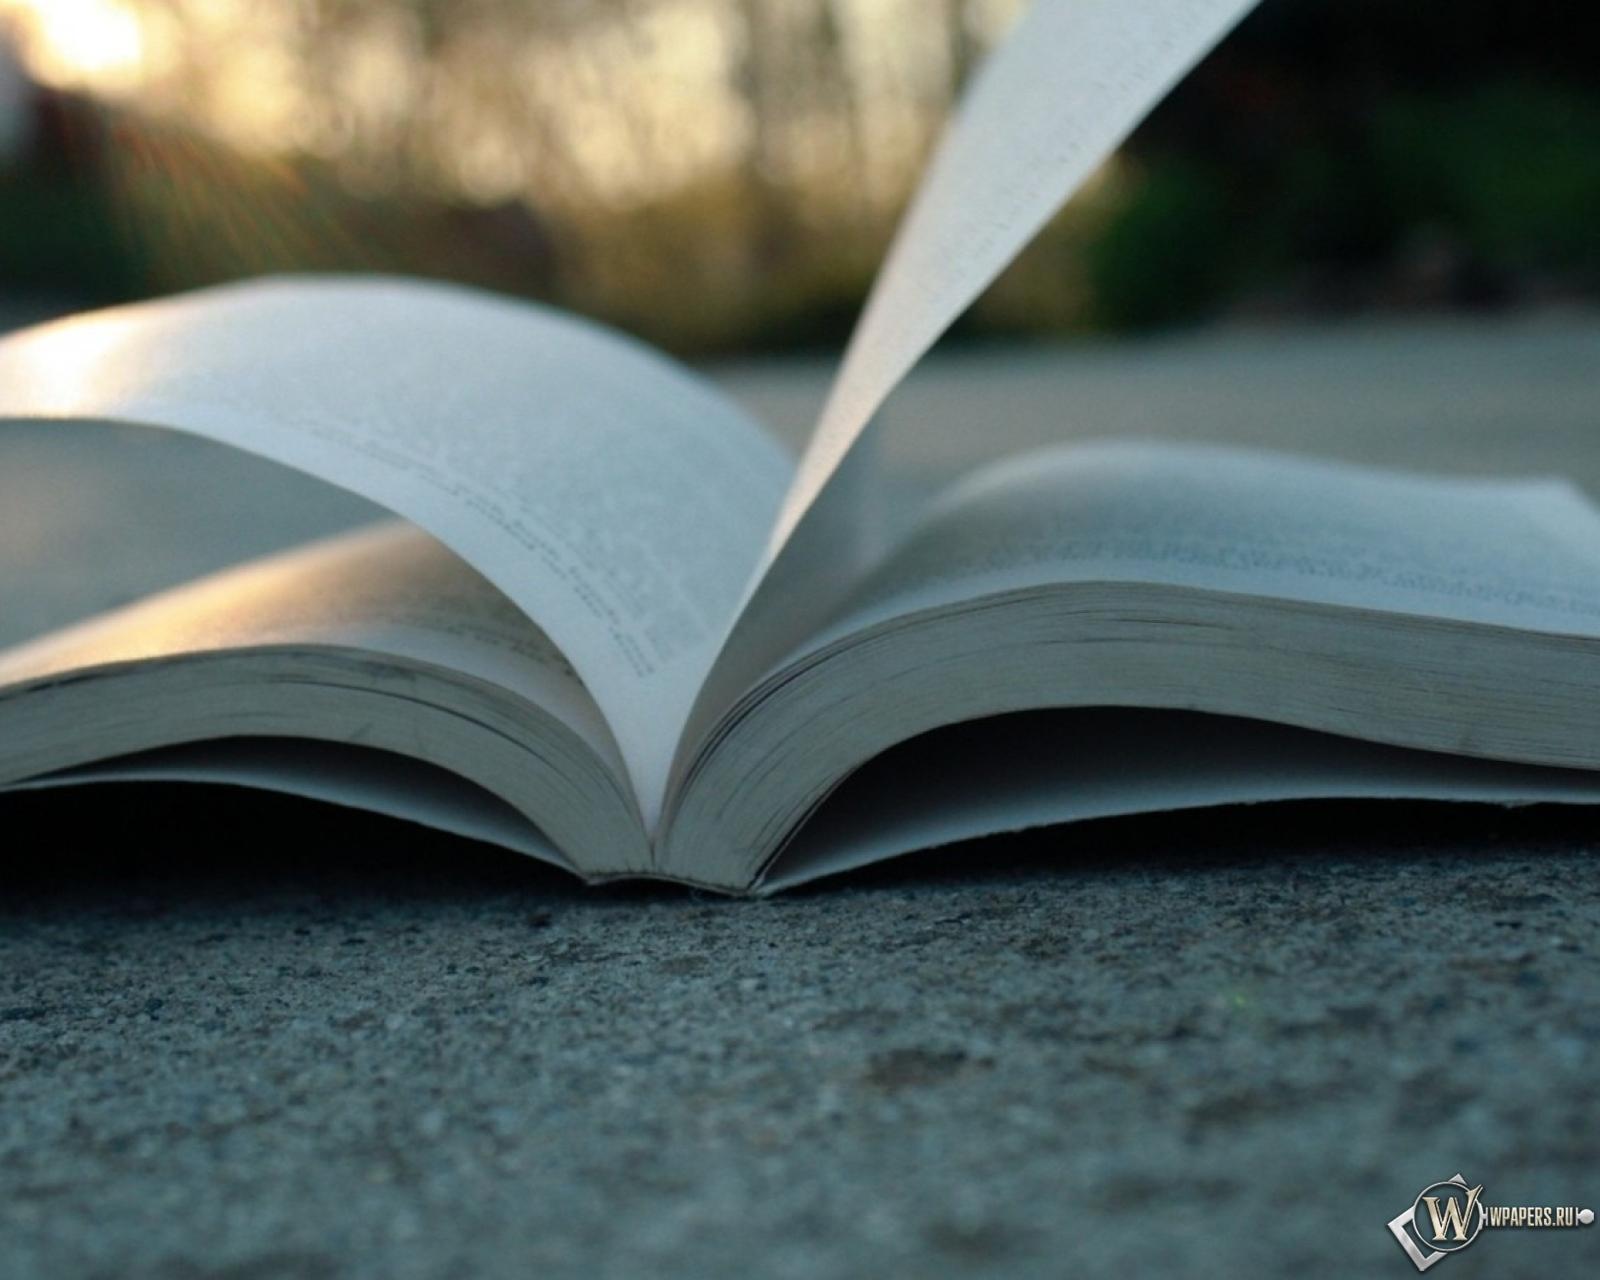 Книга картинки с большим разрешением